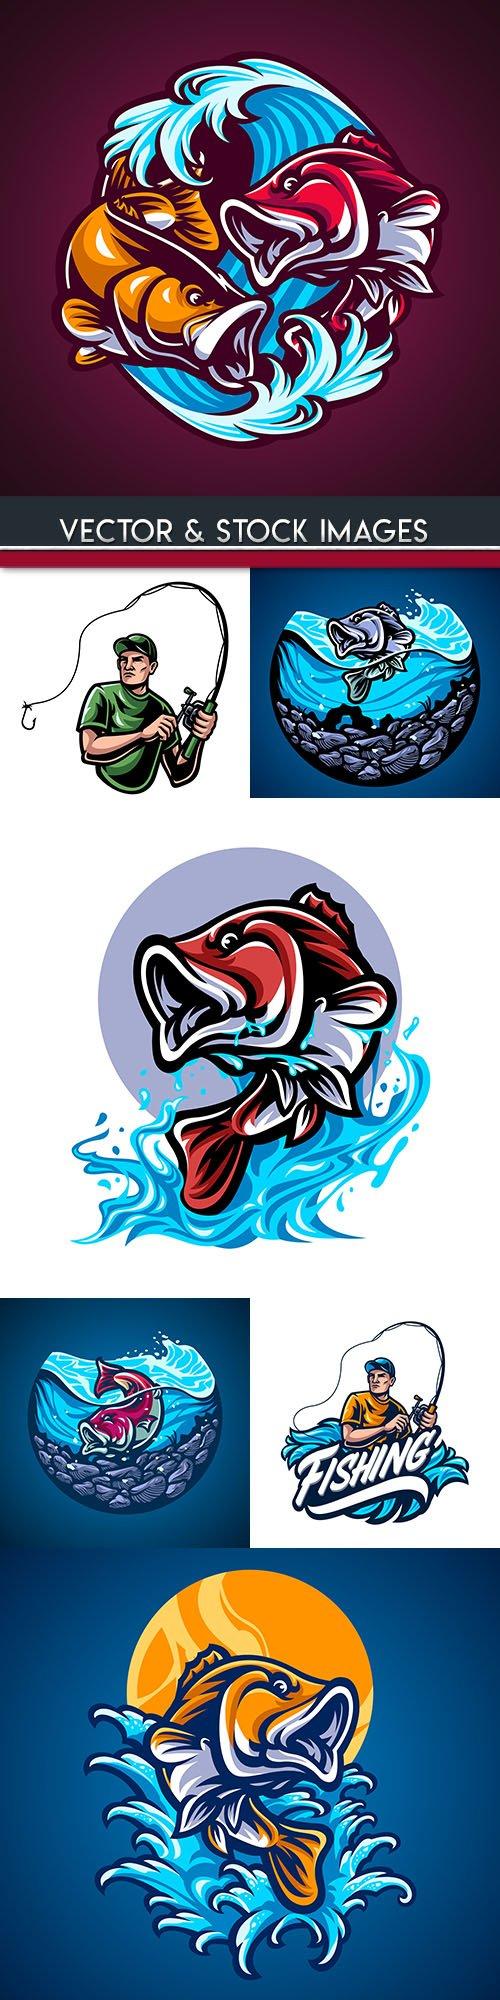 Fish handdrawn illustrations design logo